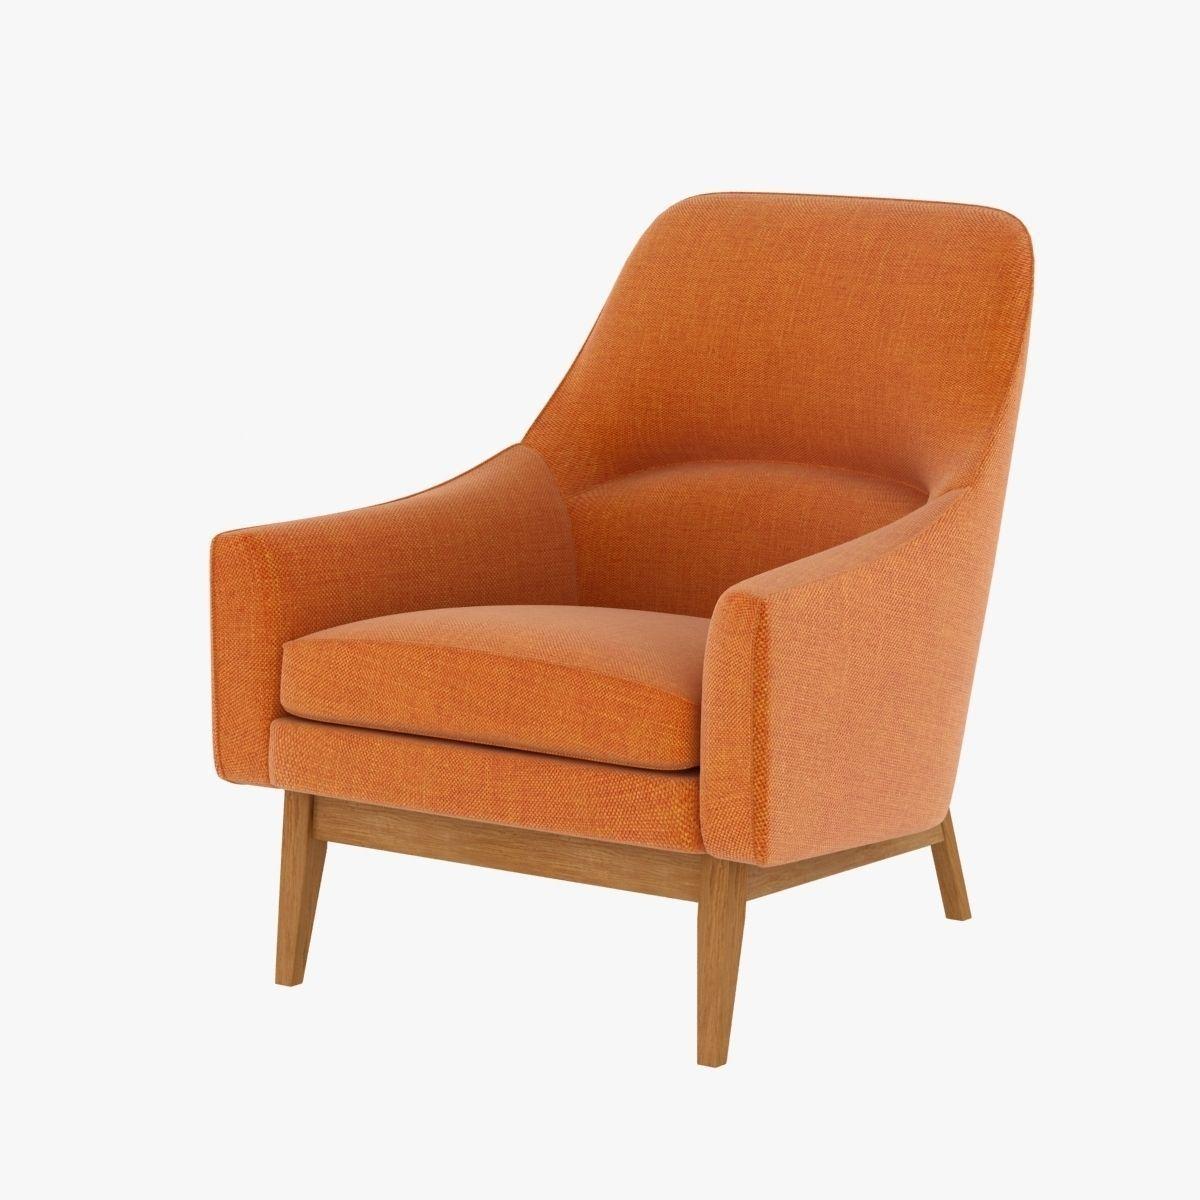 Ralph pucci jens risom chair 3d model max obj 3ds fbx for Model furniture